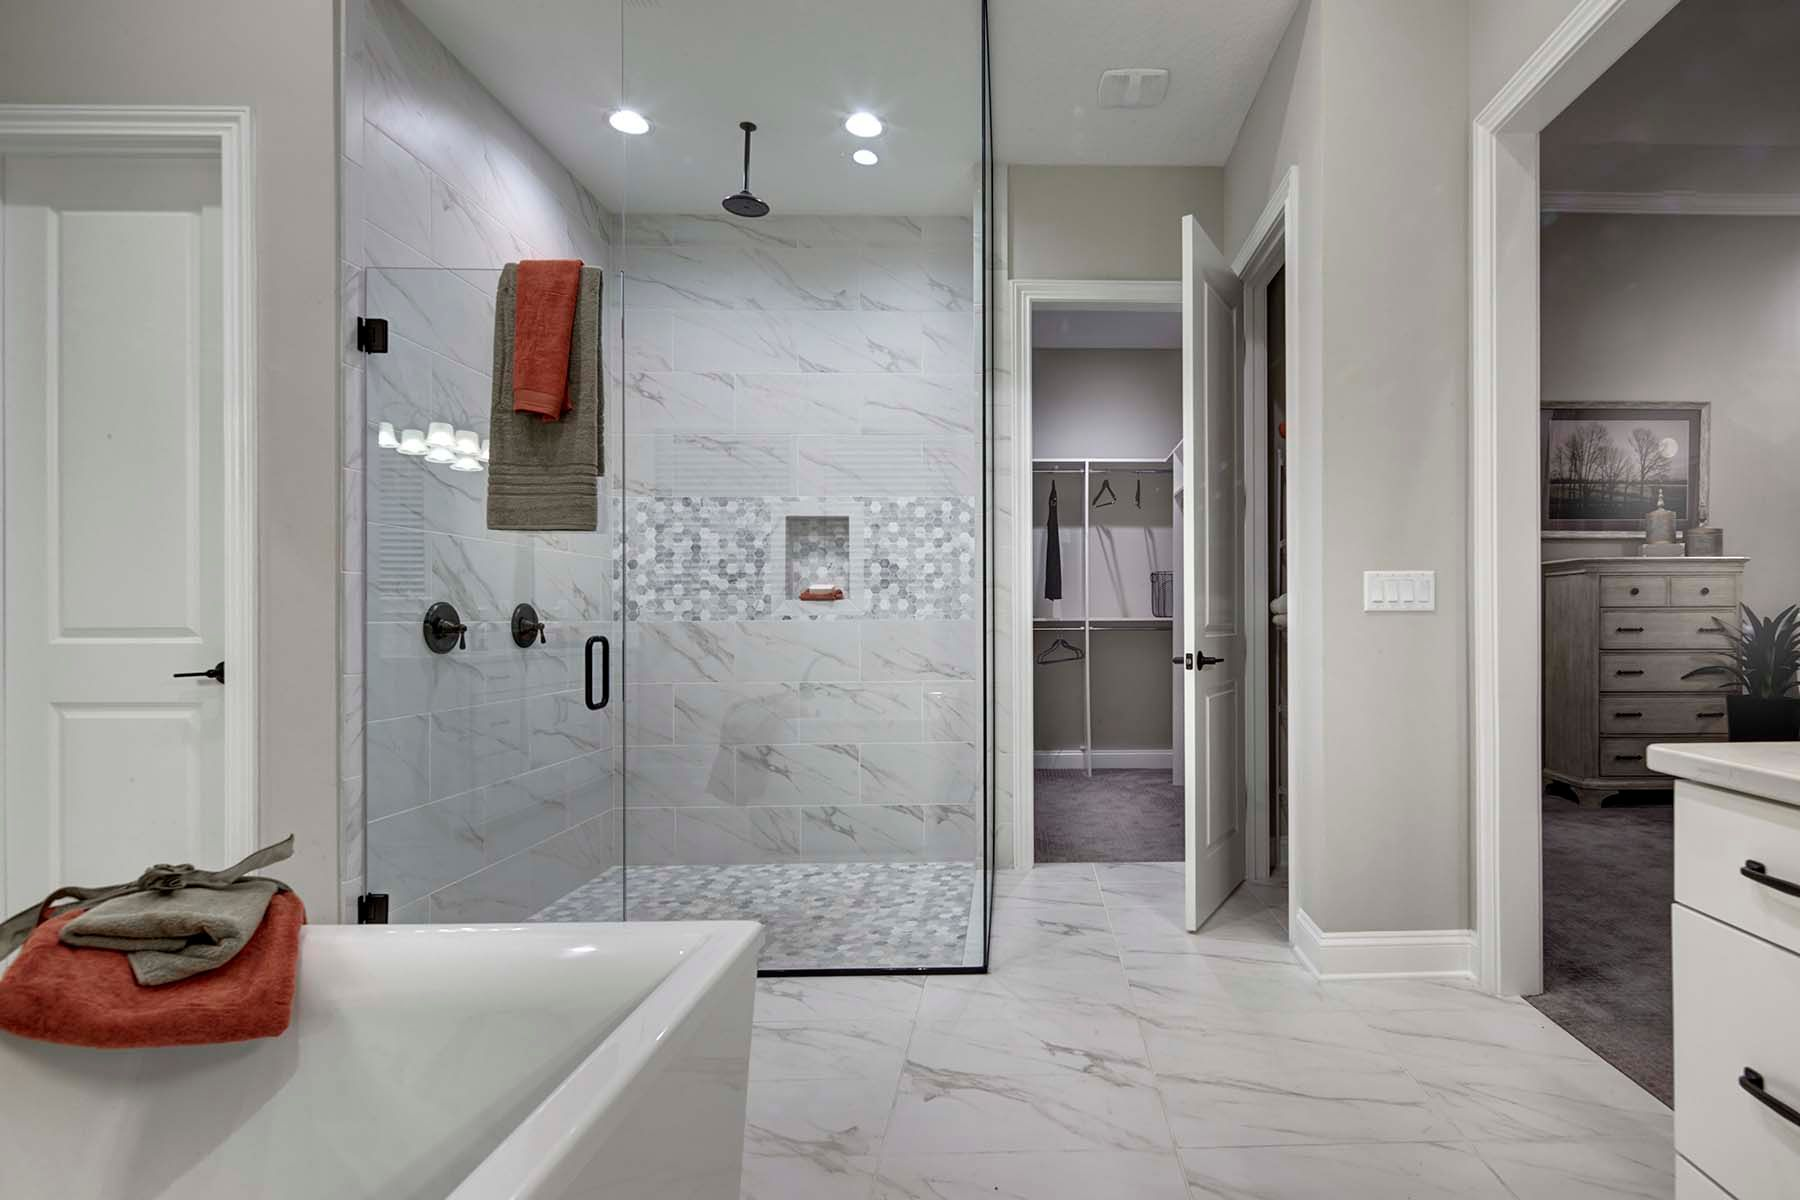 Bathroom featured in the Iris By Mattamy Homes in Jacksonville-St. Augustine, FL